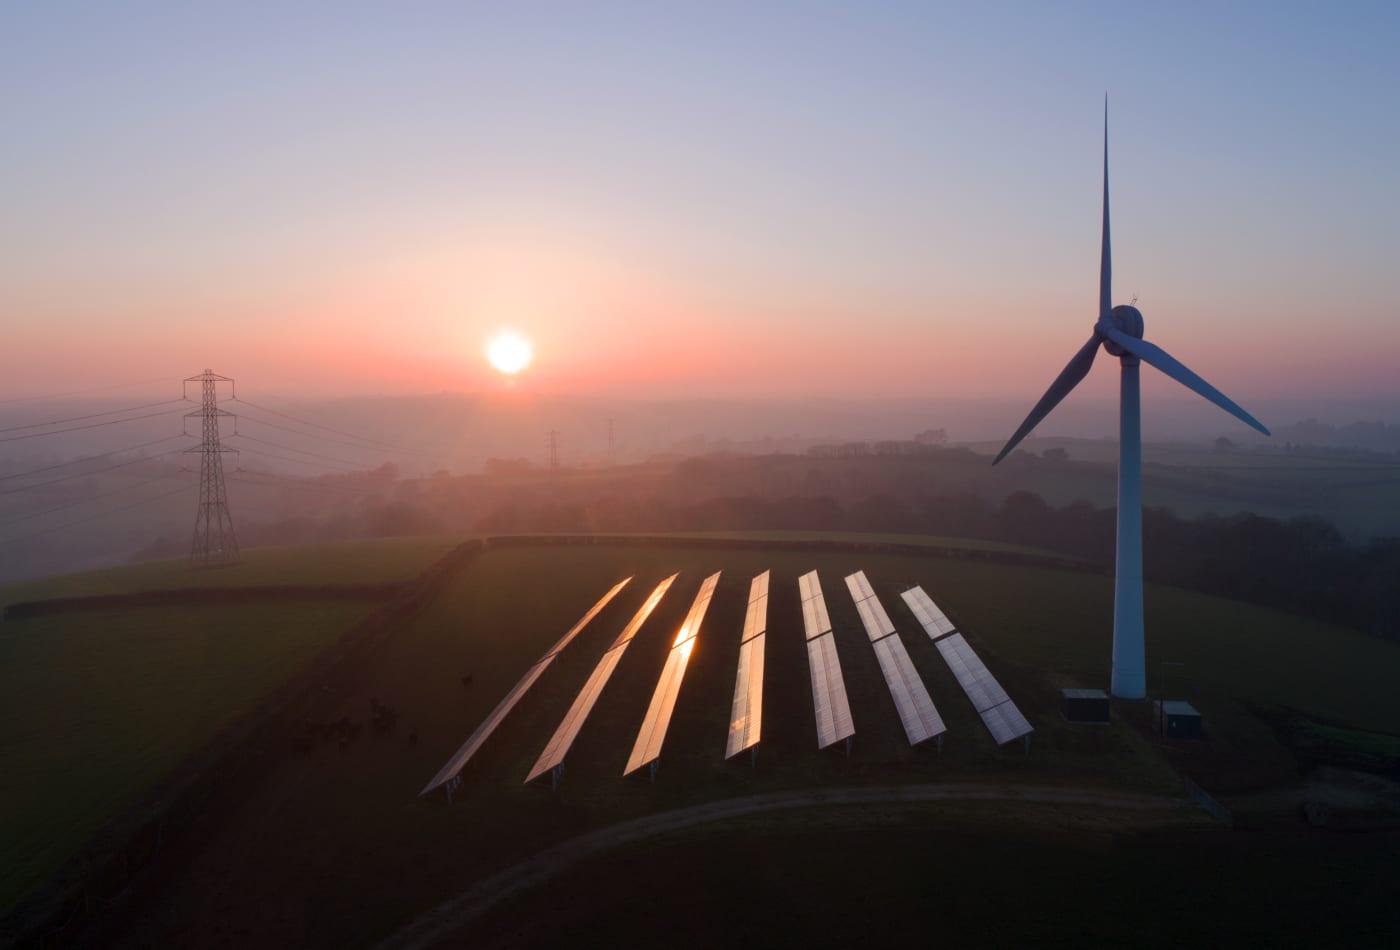 Goldman's renewable stock portfolio seeks to capitalize on the trillions in green spending ahead